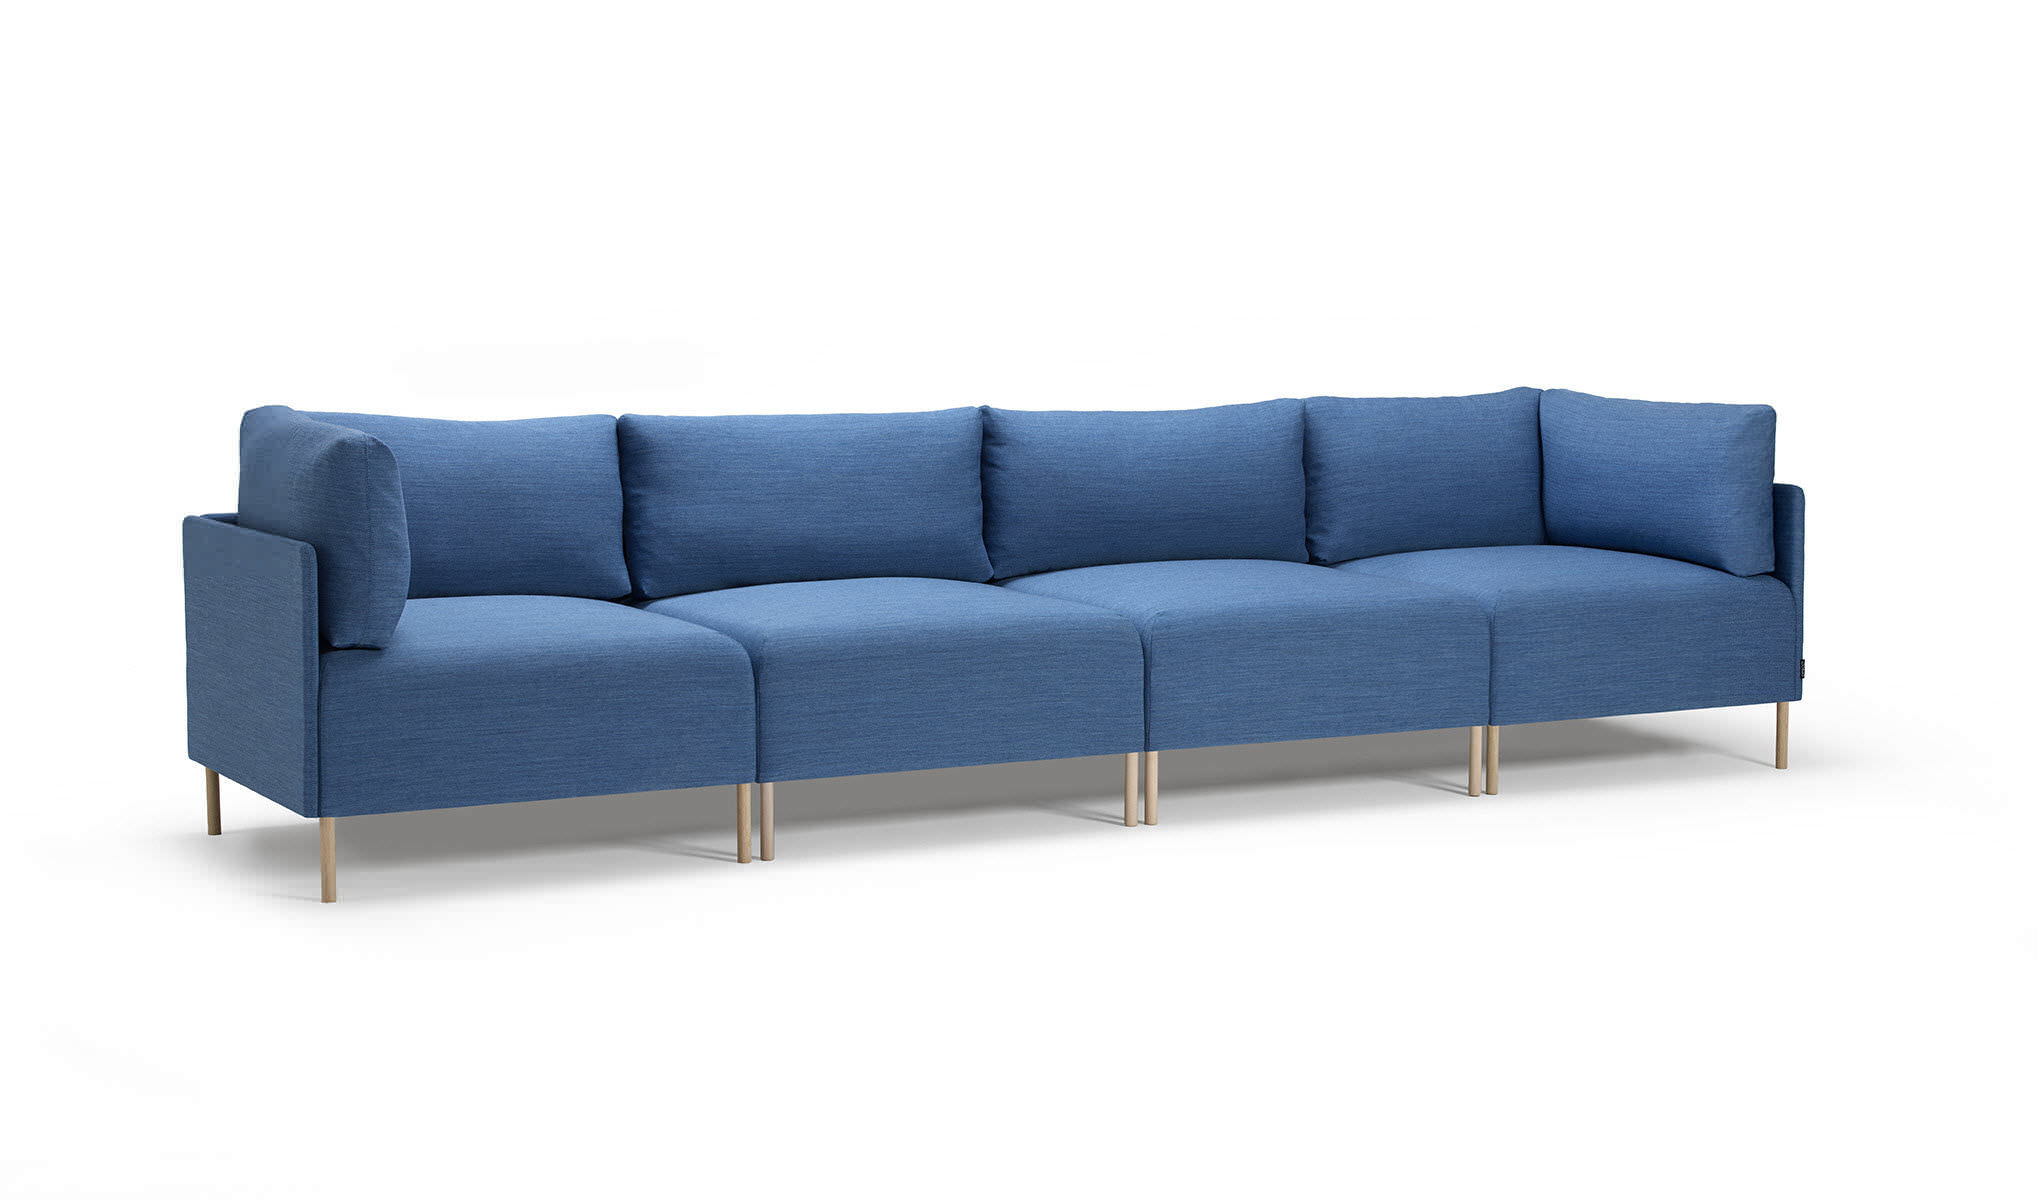 Modular sofa contemporary leather fabric BLOCKS OFFECCT